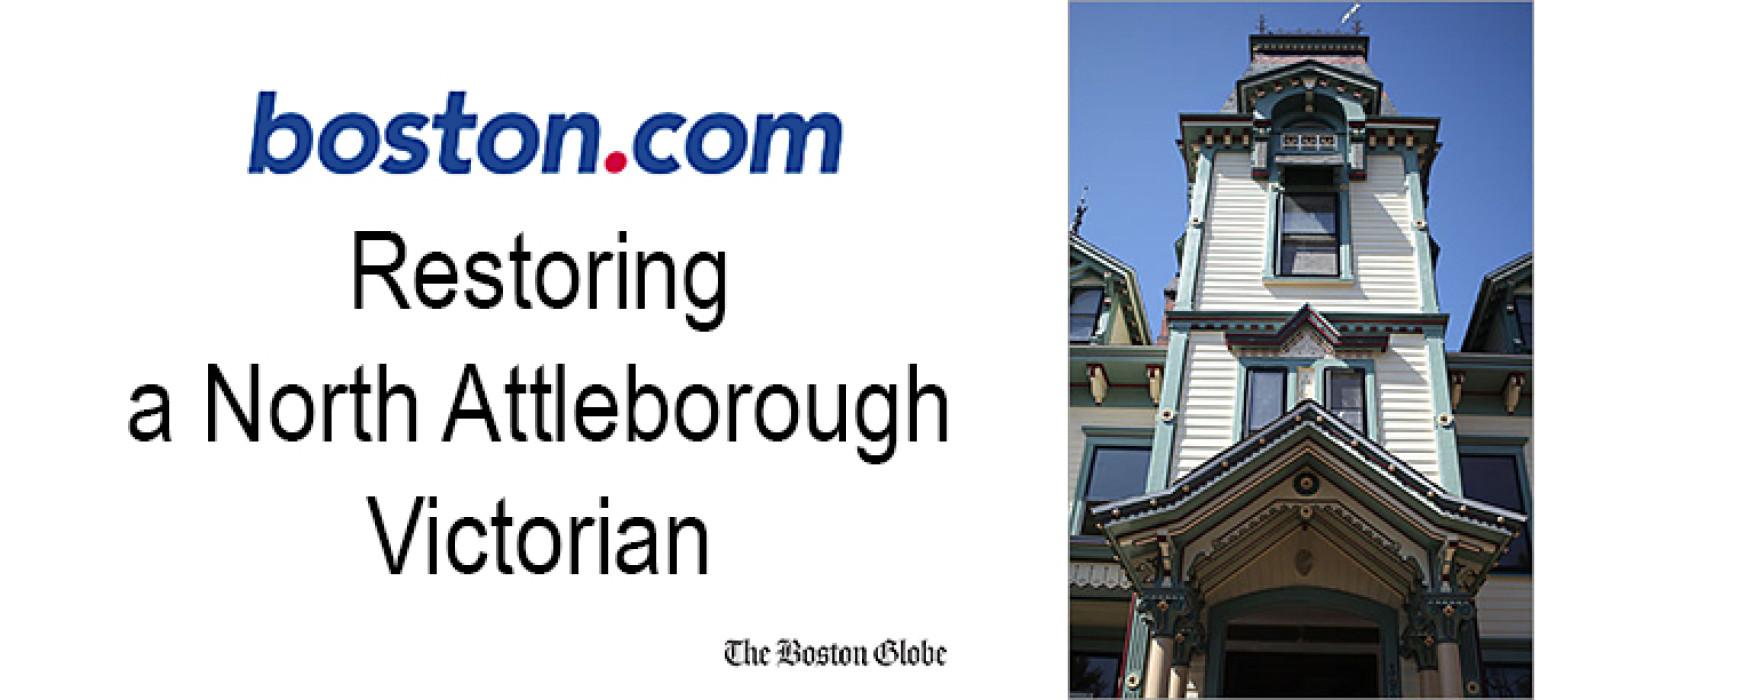 boston.com: Hewing classic home into modern era